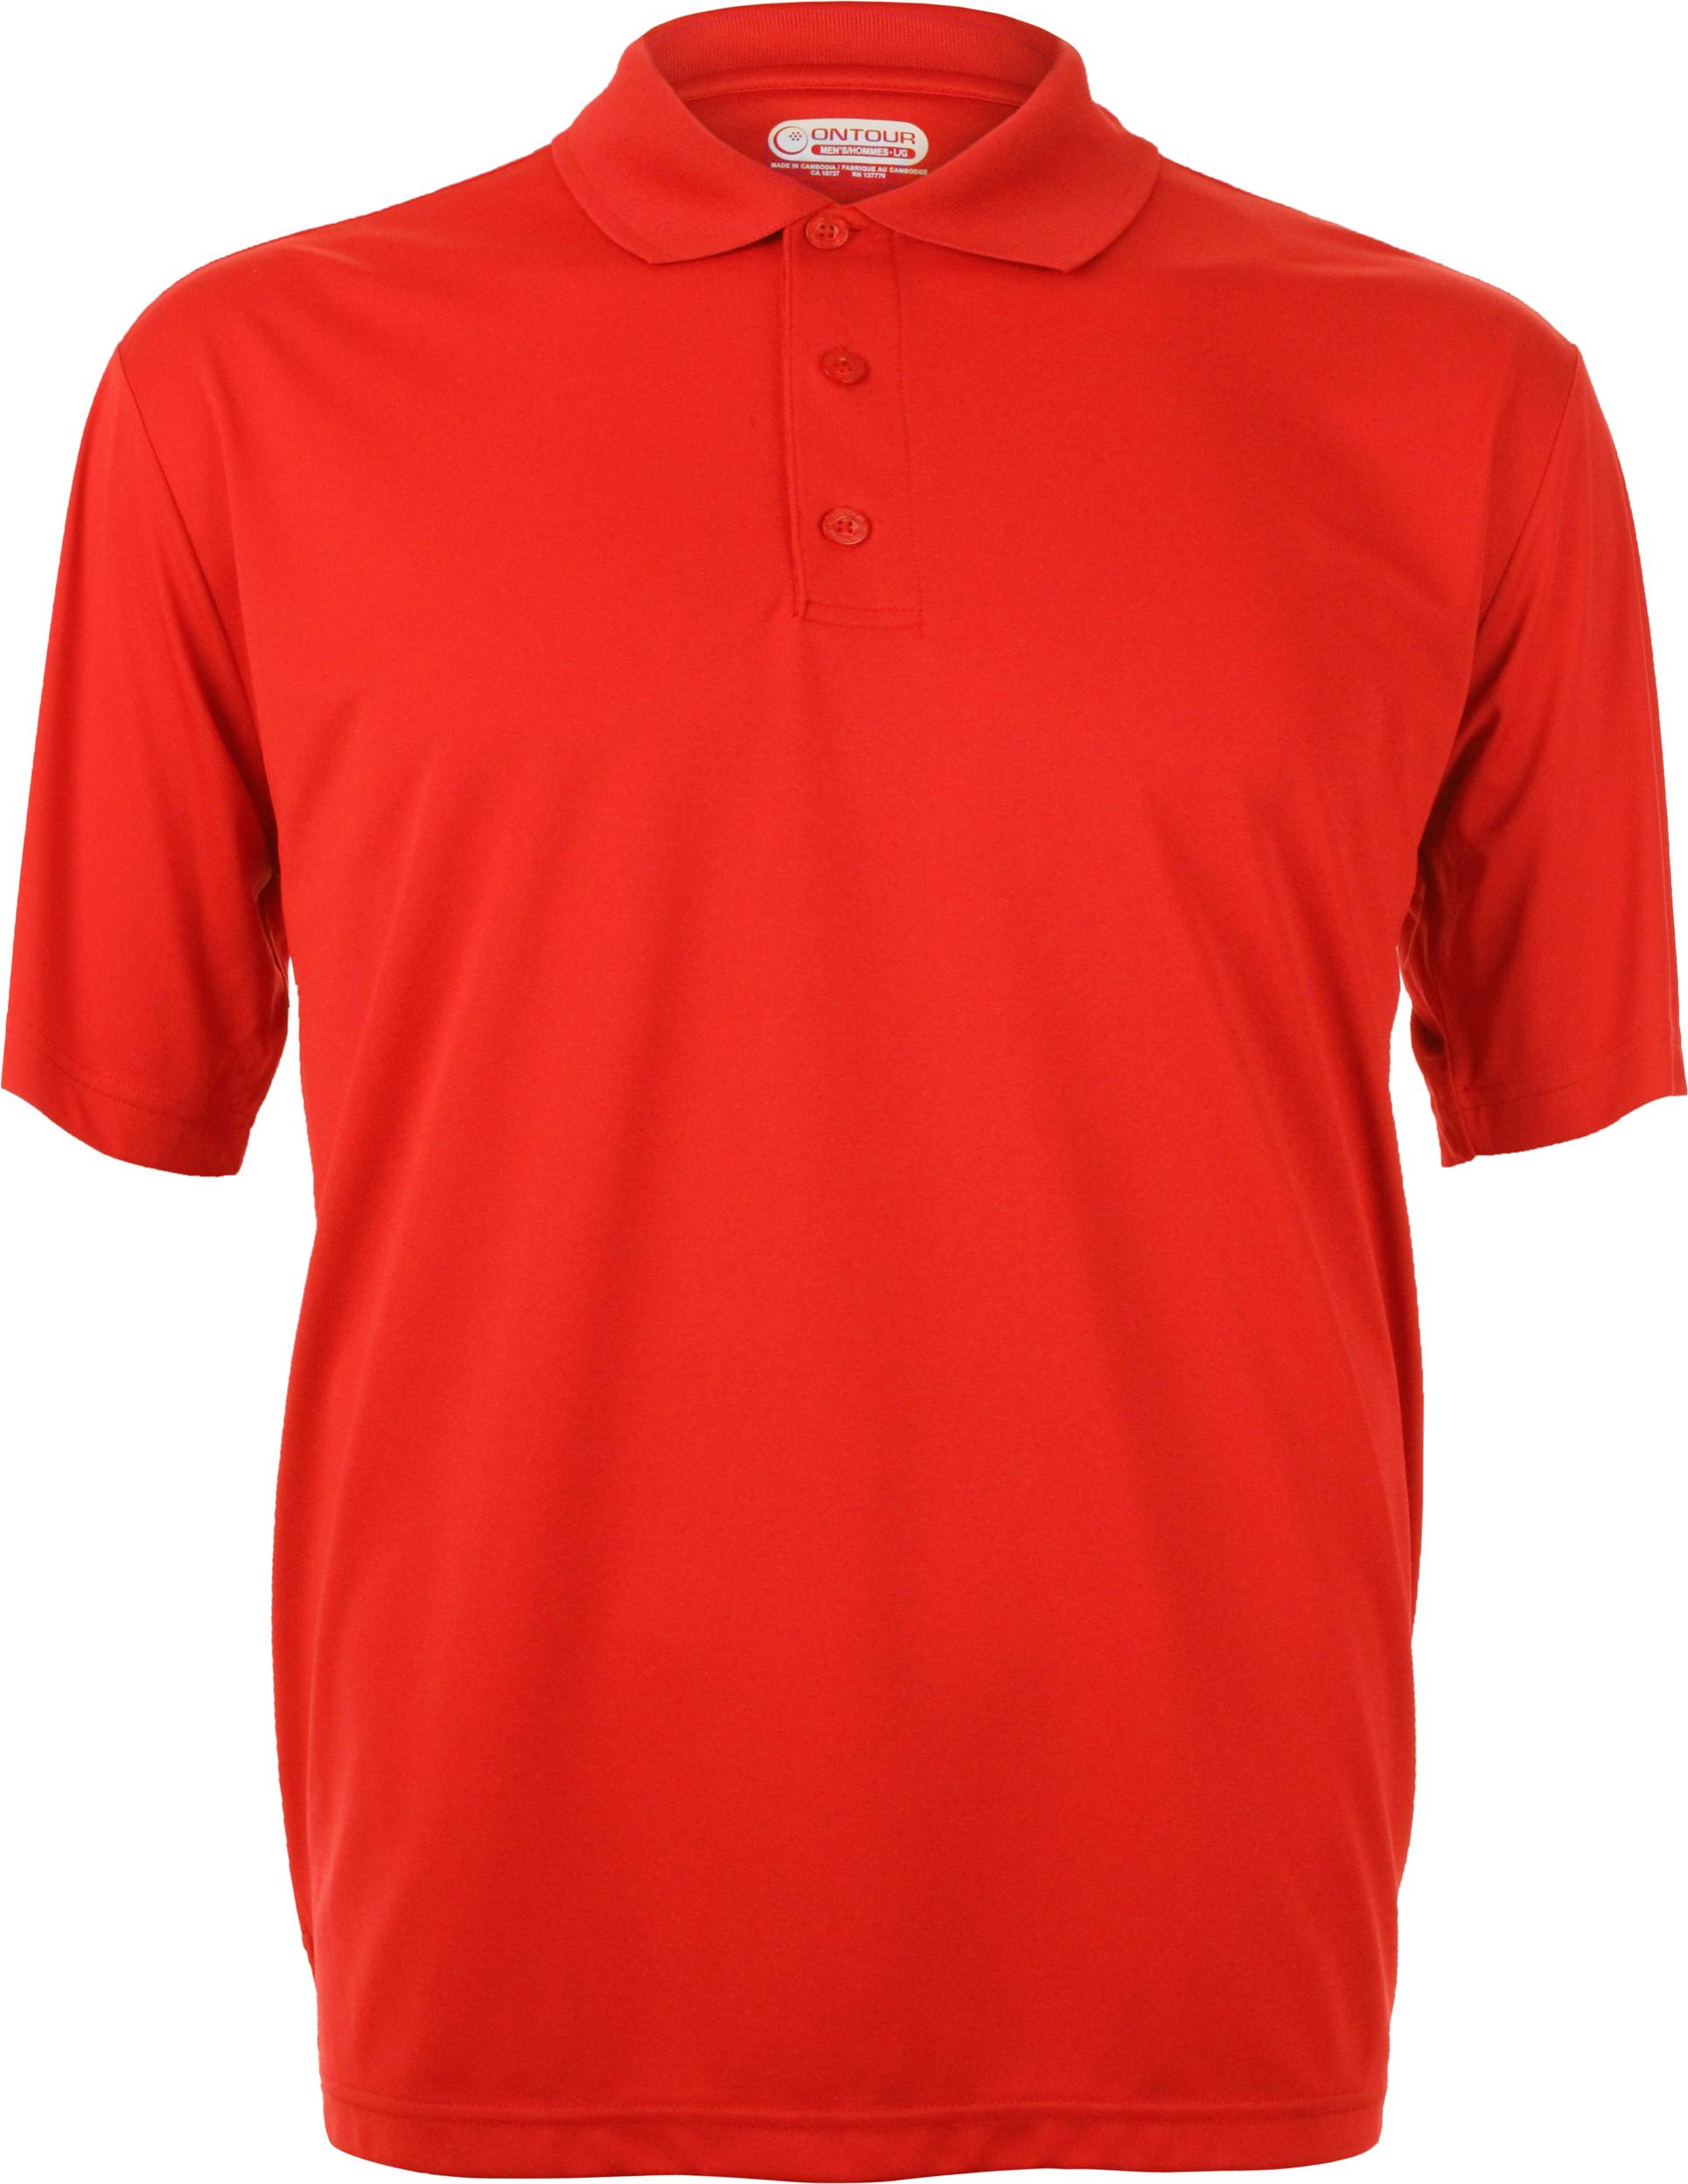 Red Polo Shirt Red Polo Shirt Custom Polo Shirts Shirts